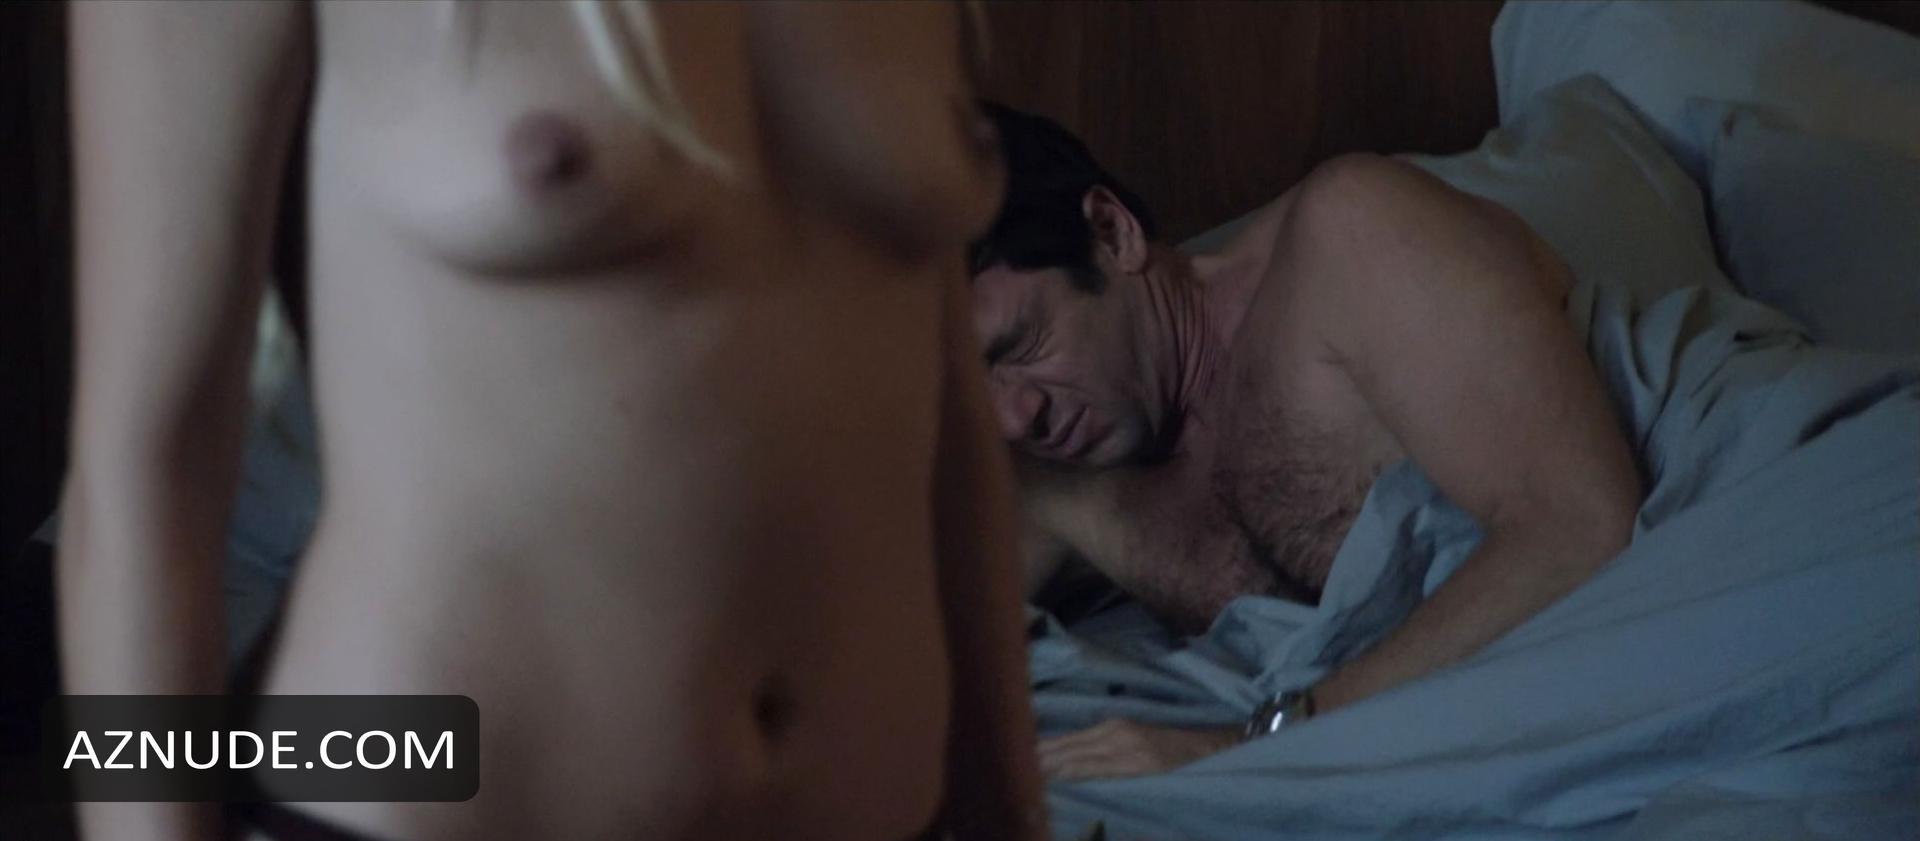 Saggy nipples breasts nude